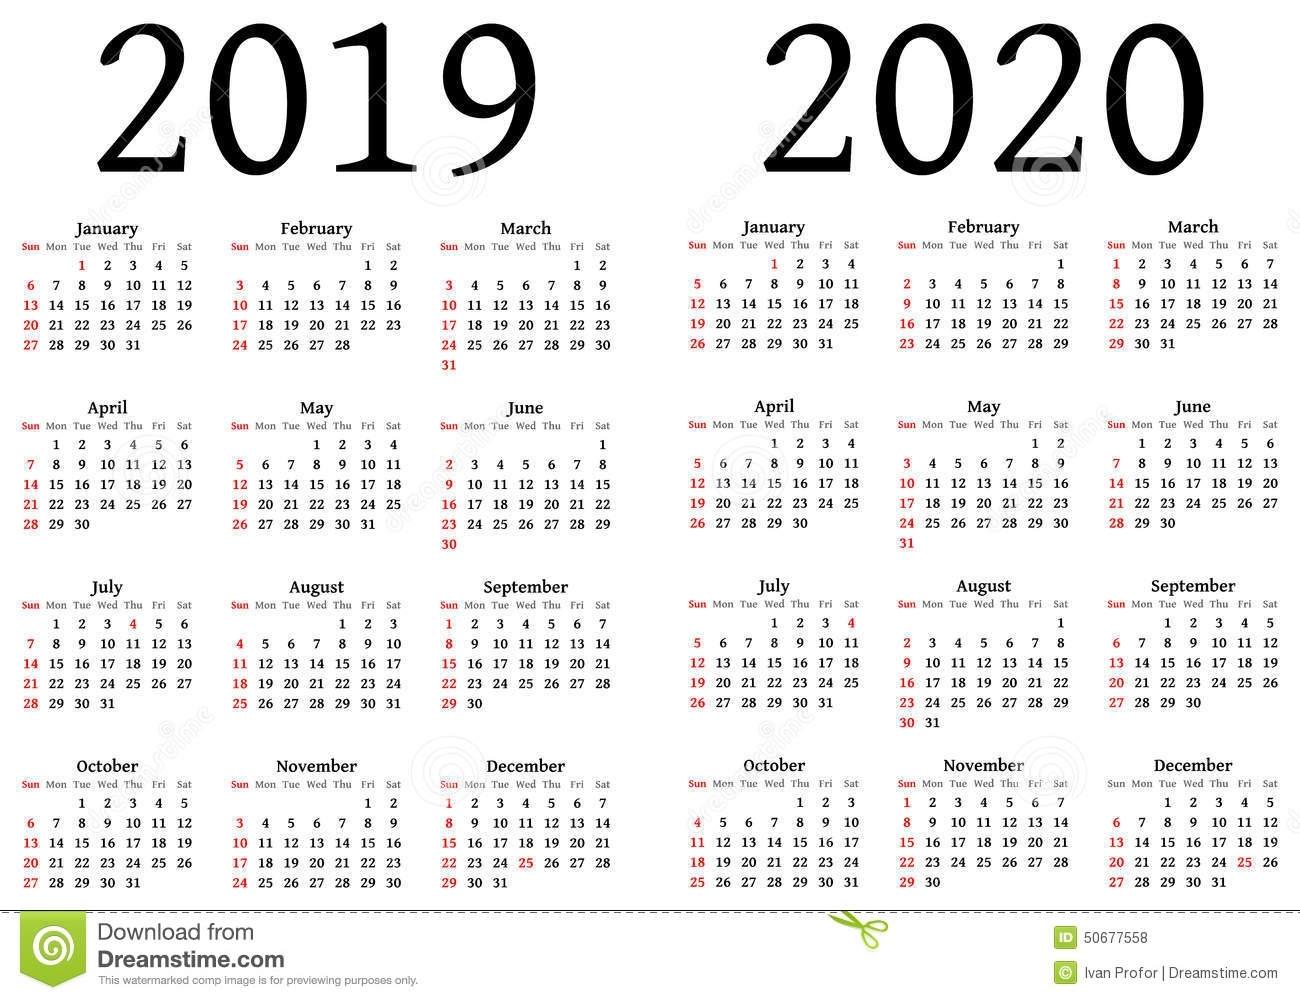 Calendar For 2019 And 2020 Stock Vector. Illustration Of Designers regarding Free Printable 2019 2020 Calendar